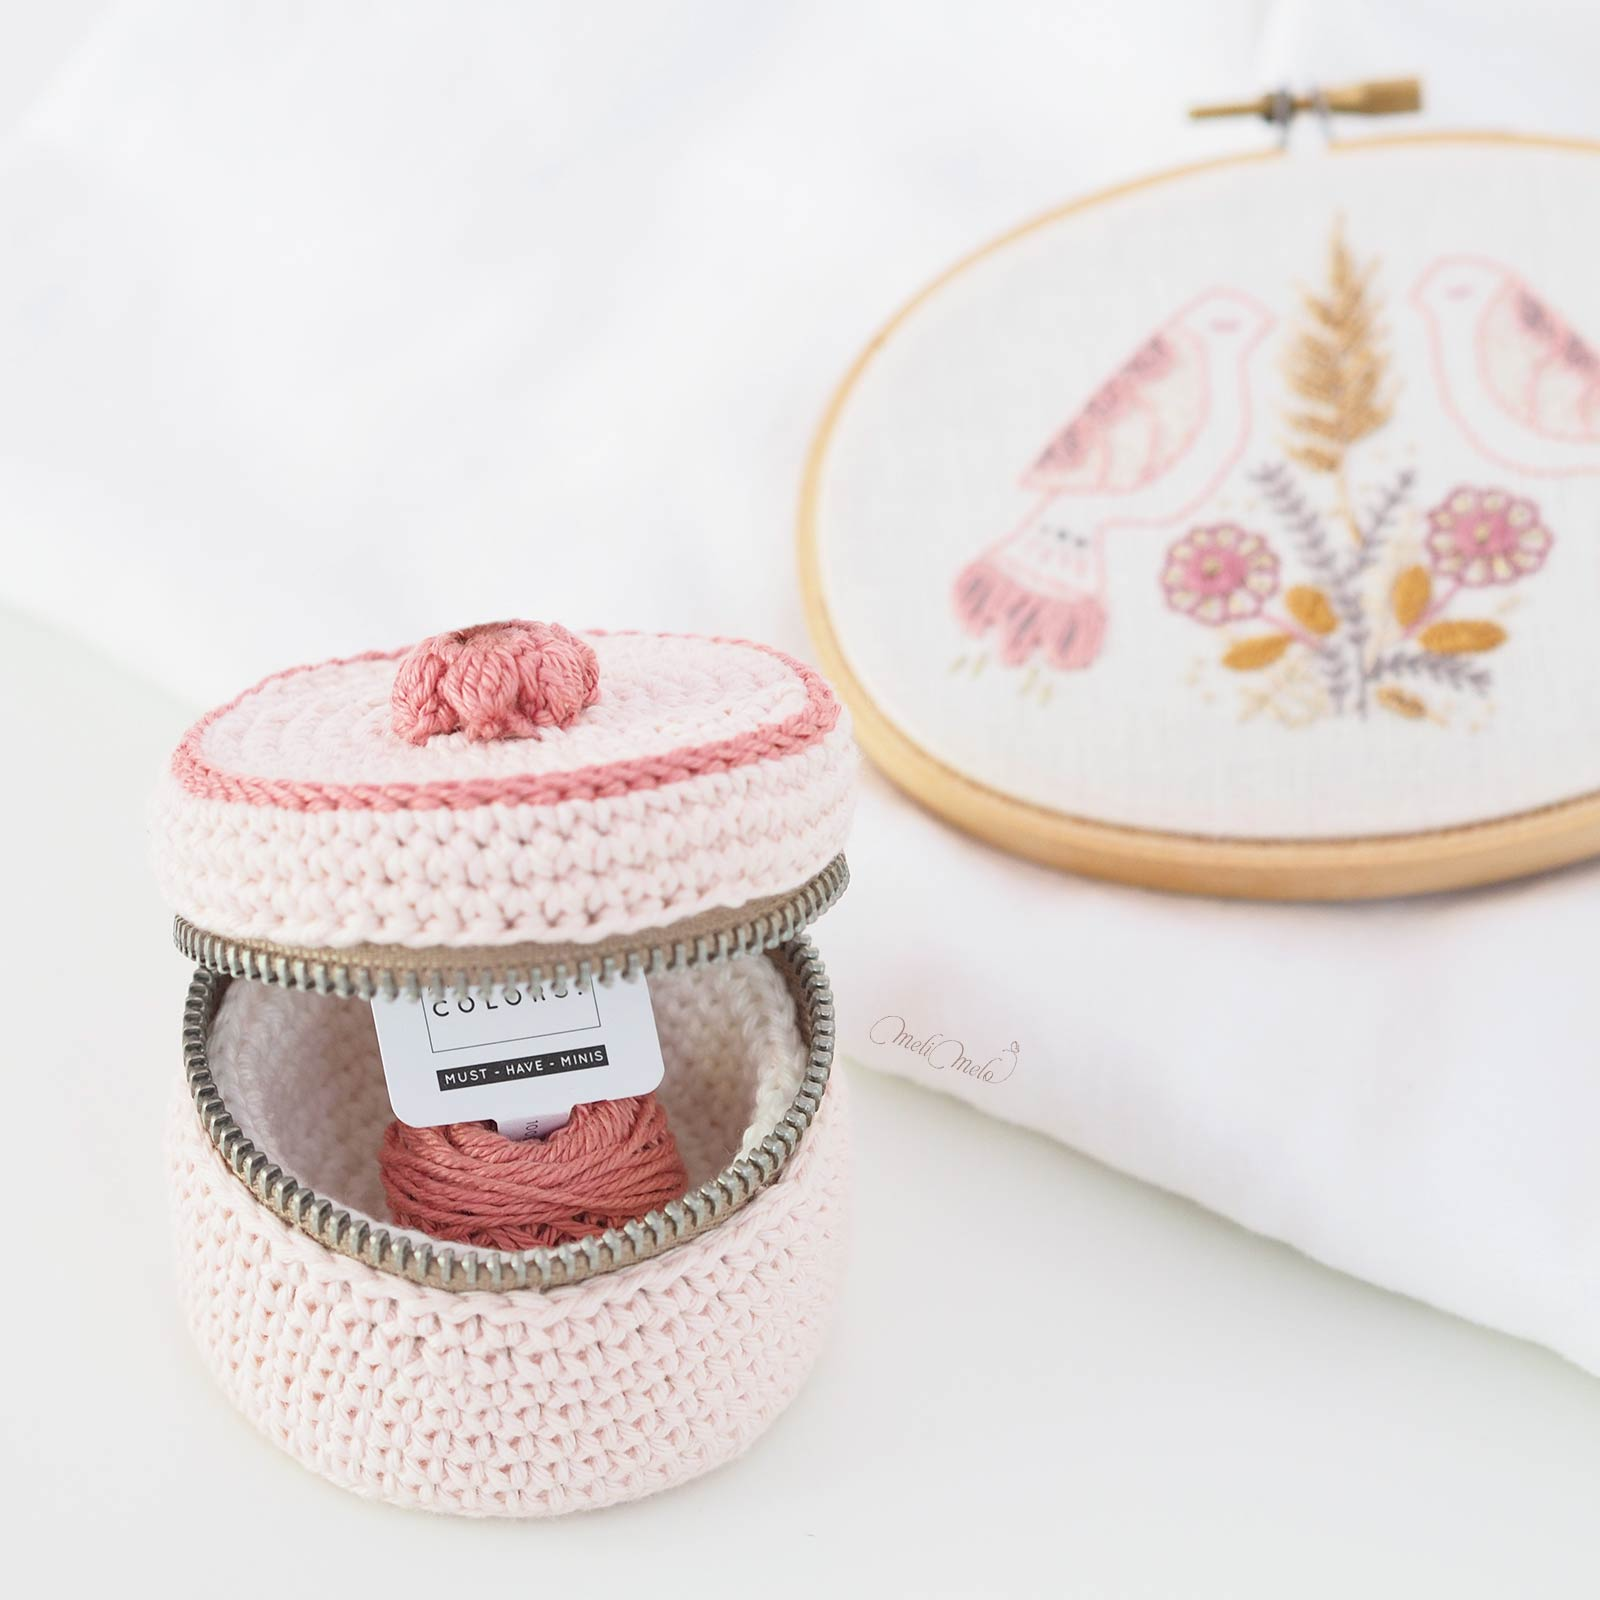 boite-rose-reve-crochet-coton-ricorumi-must-have-minis-laboutiquedemelimelo